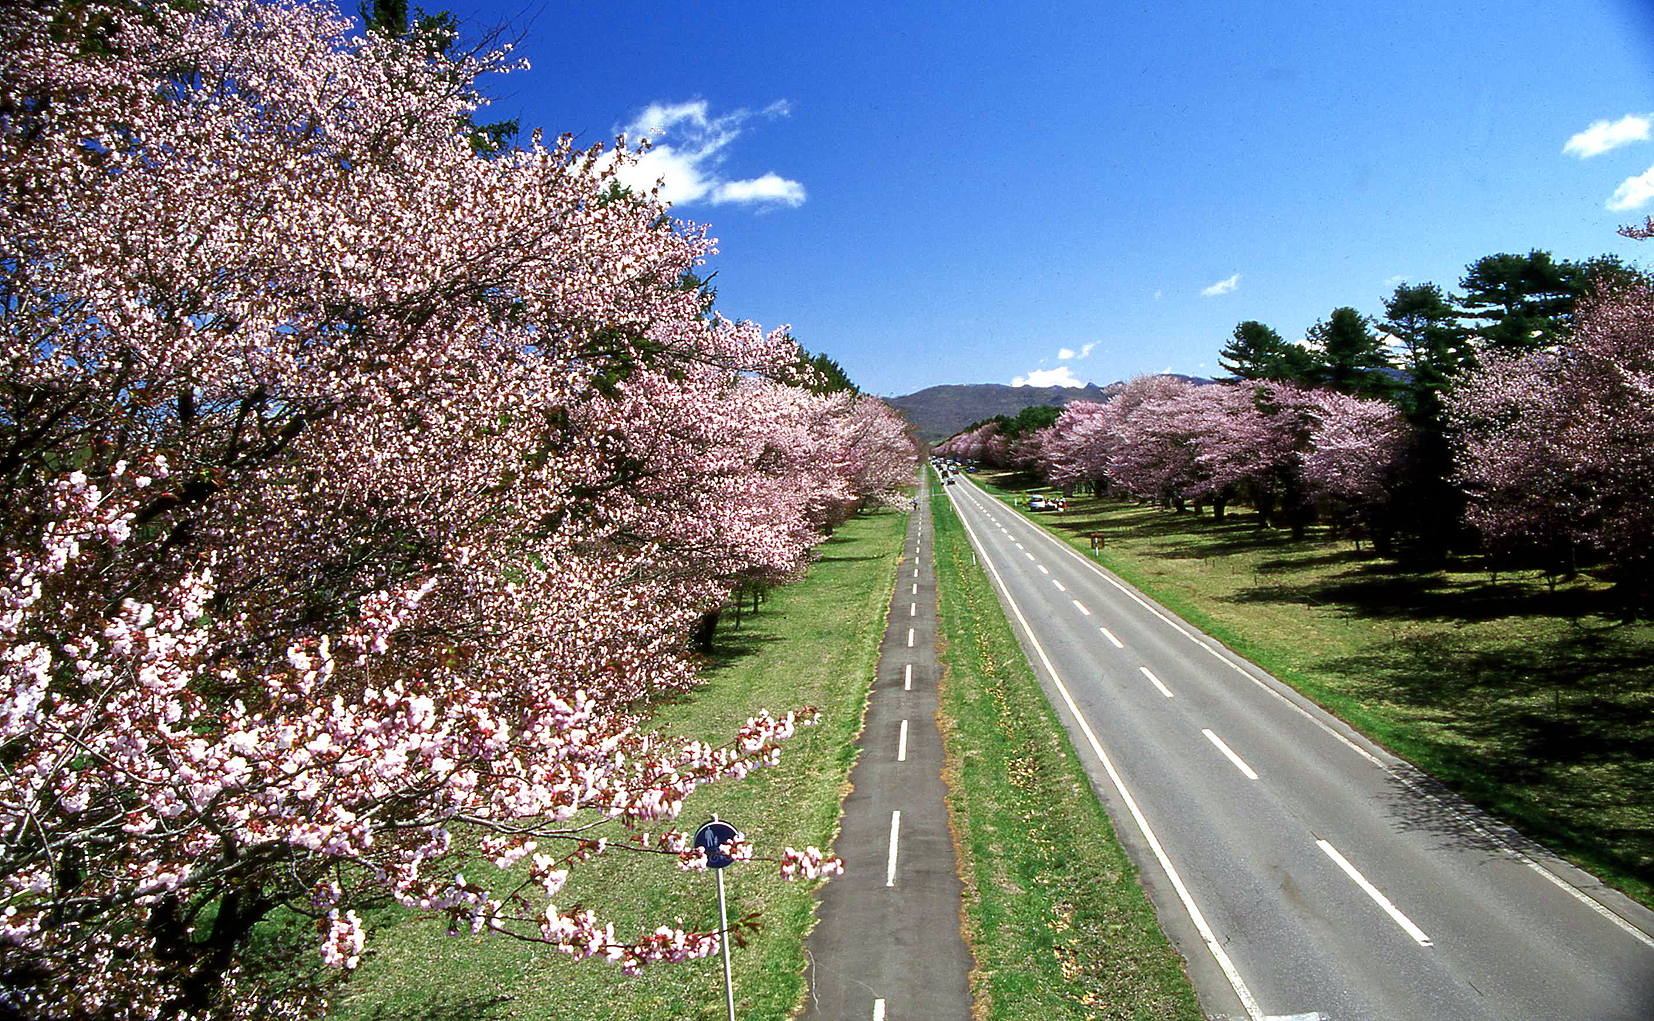 静内二十間道路桜並木と太陽の森ディマシオ美術館 札幌発着 (5/14) 札幌